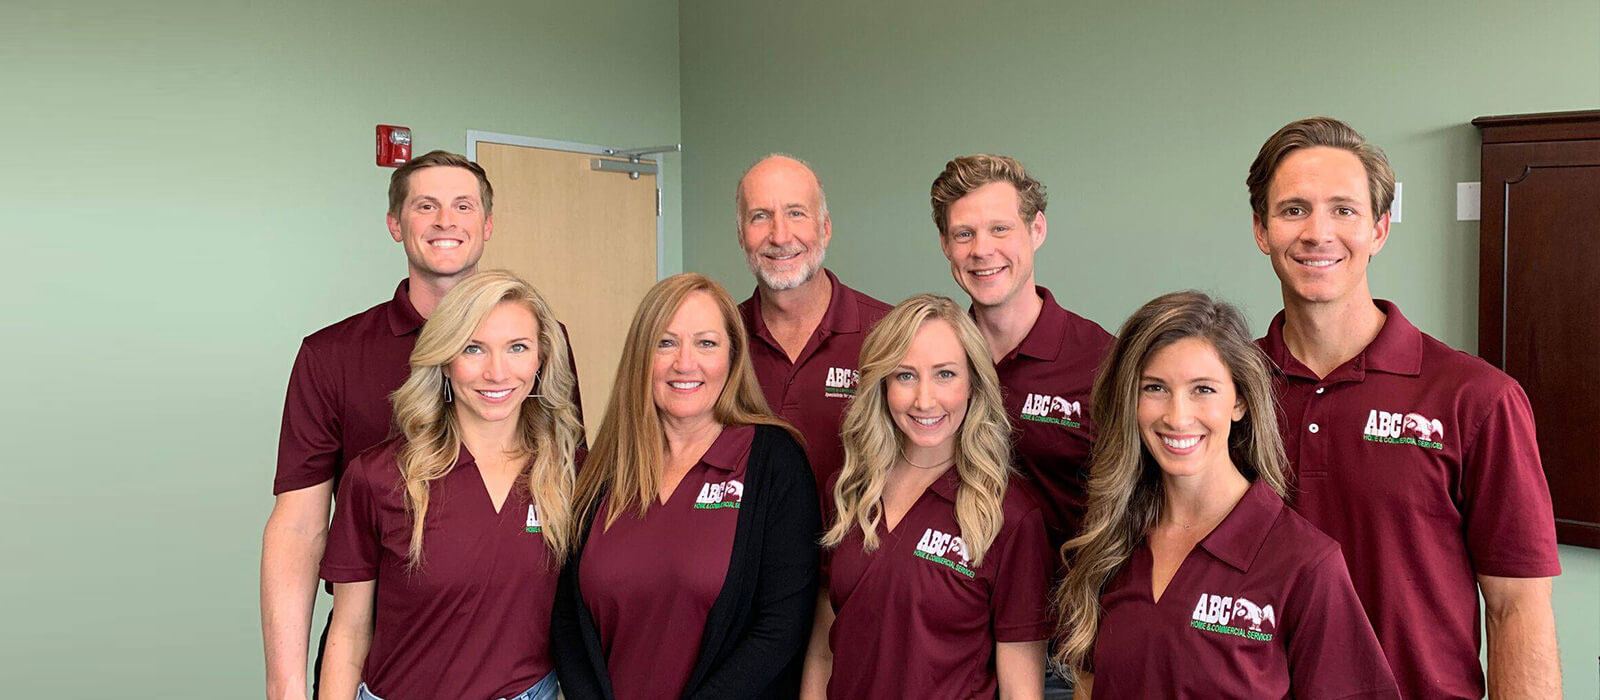 ABC Orlando team members